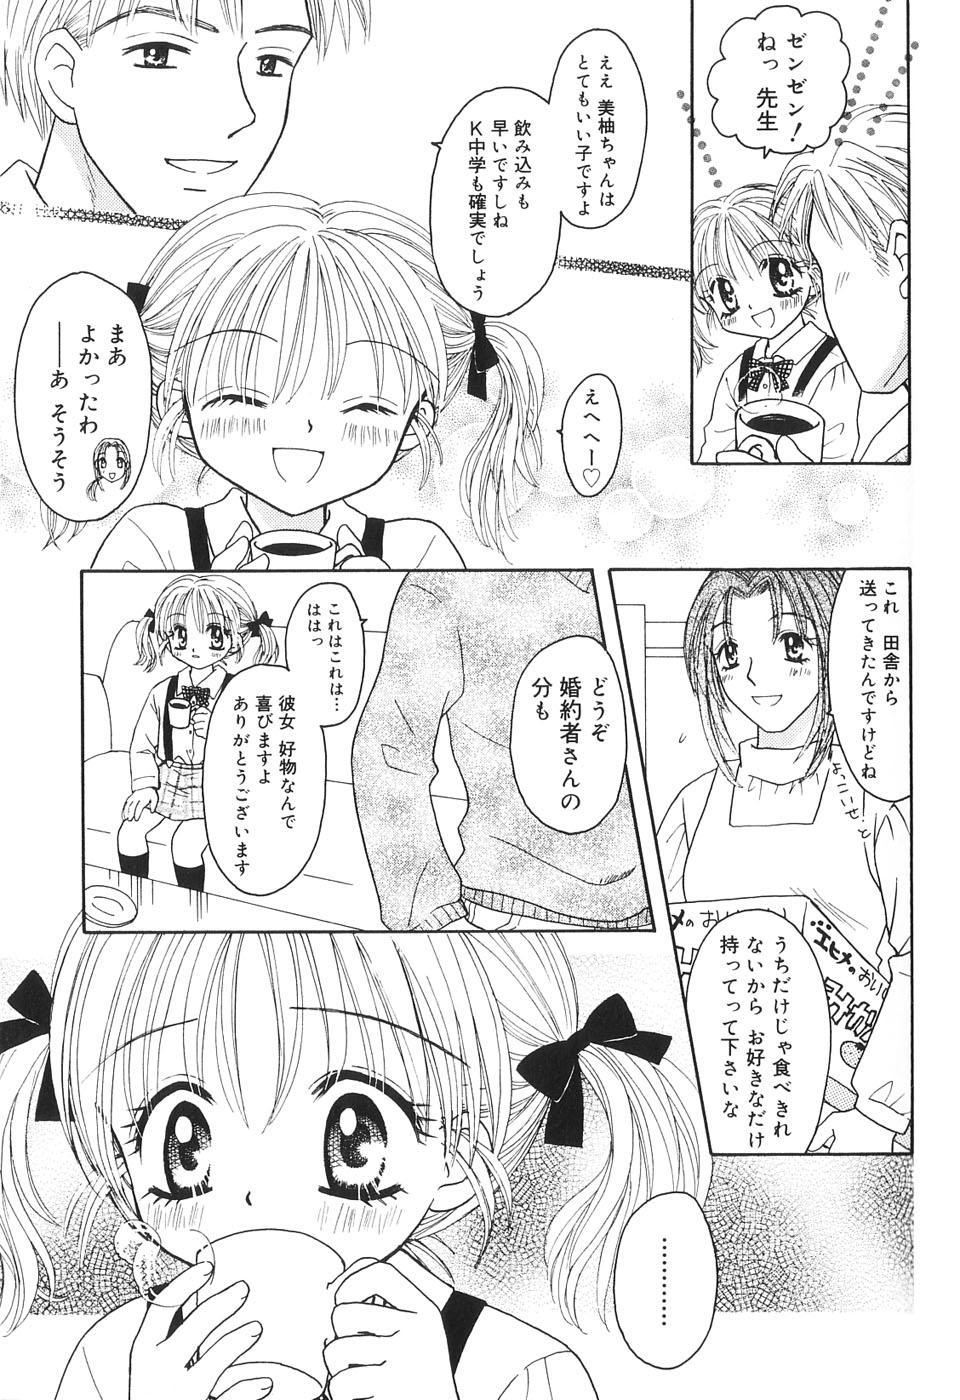 Musoubana 95